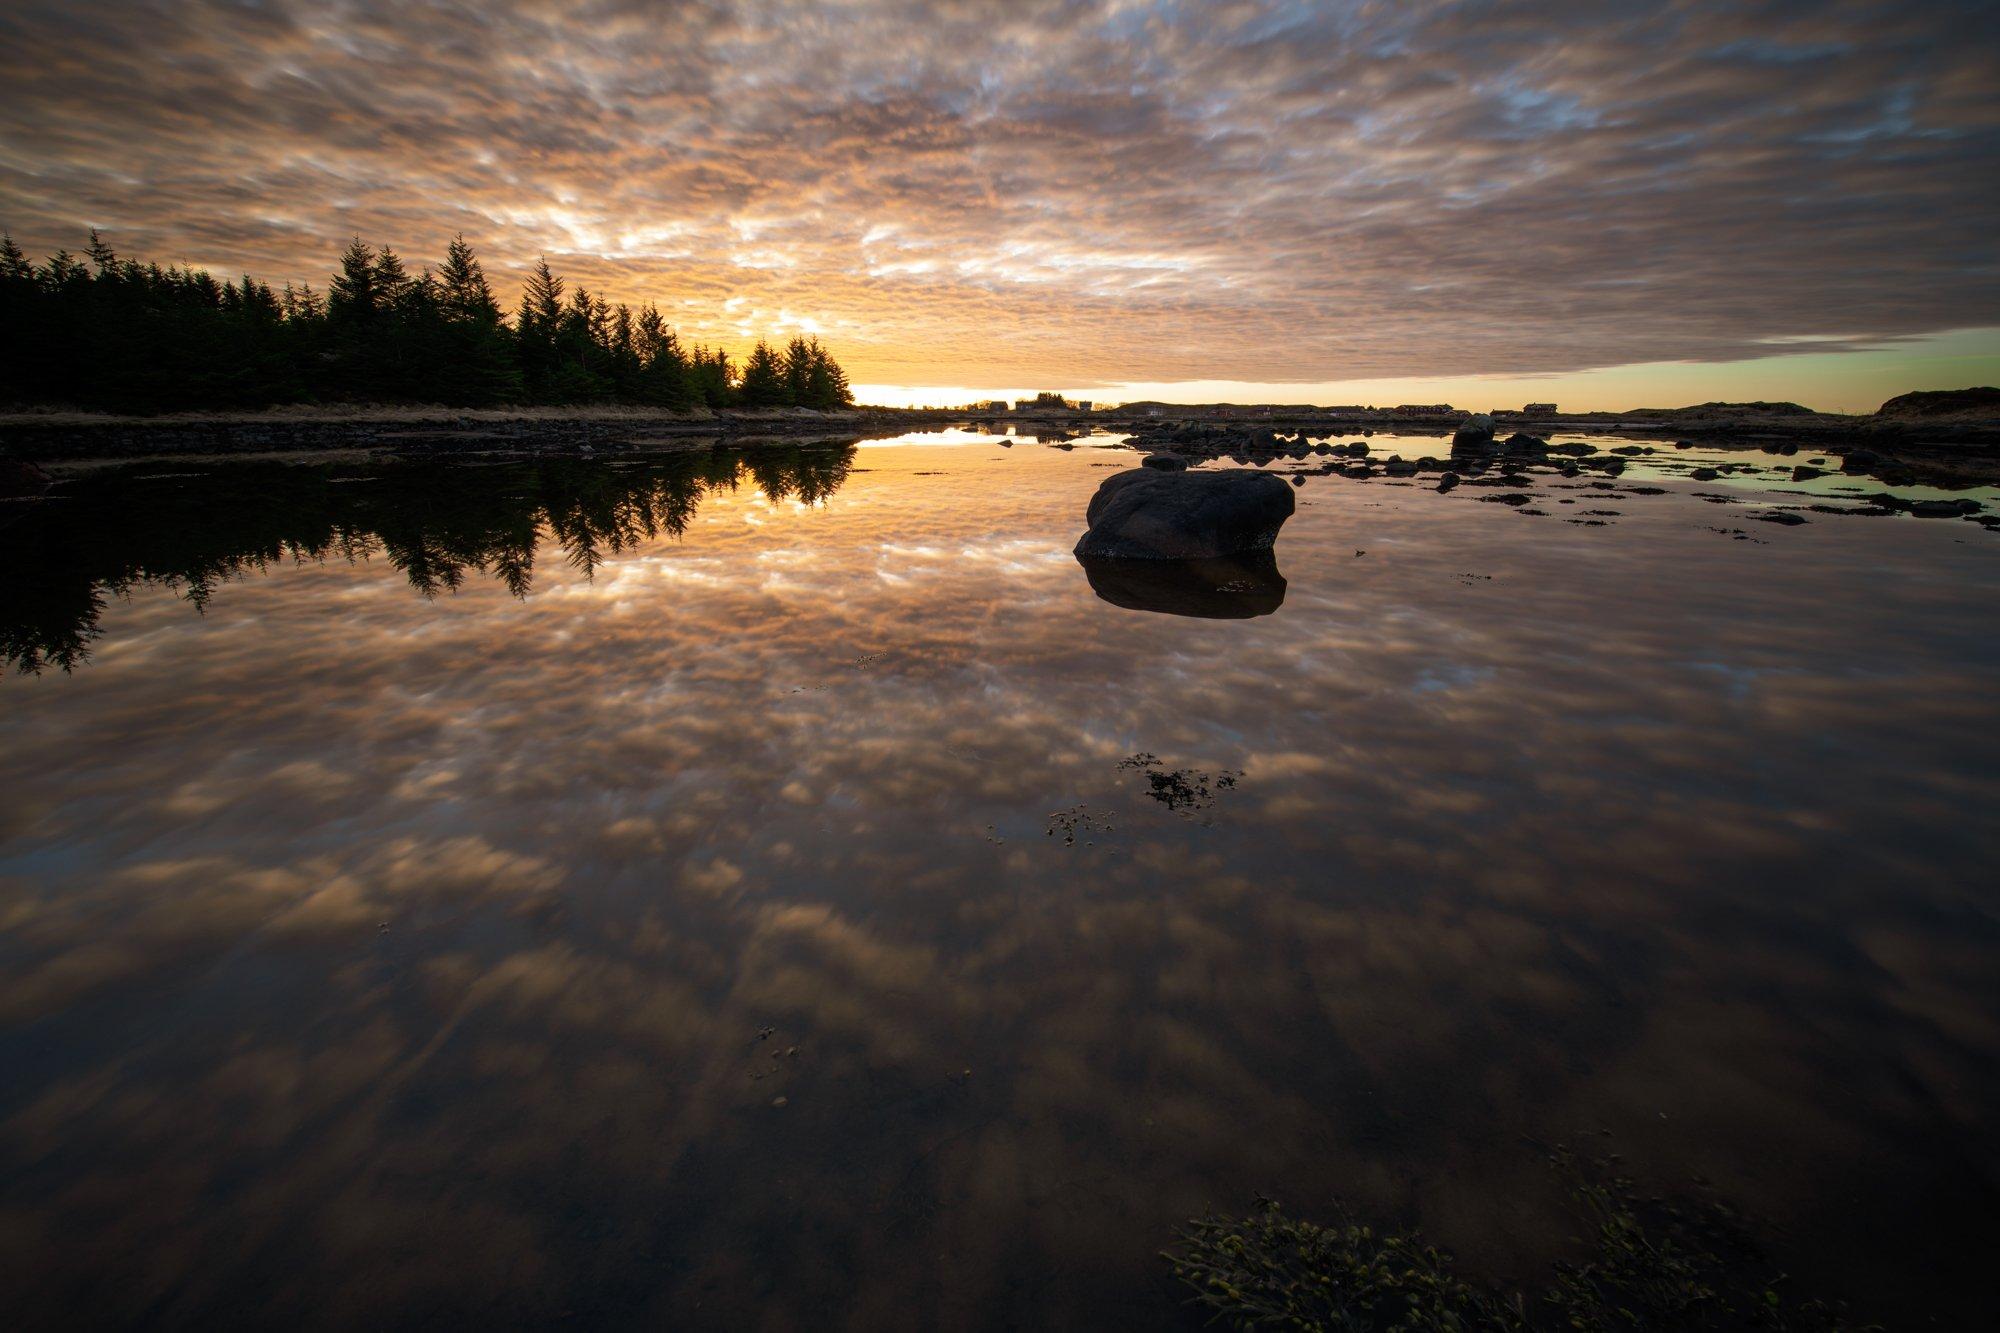 Sunset, Hustadvika, Norway, Nisi, Haida, Arnfinn Malmedal